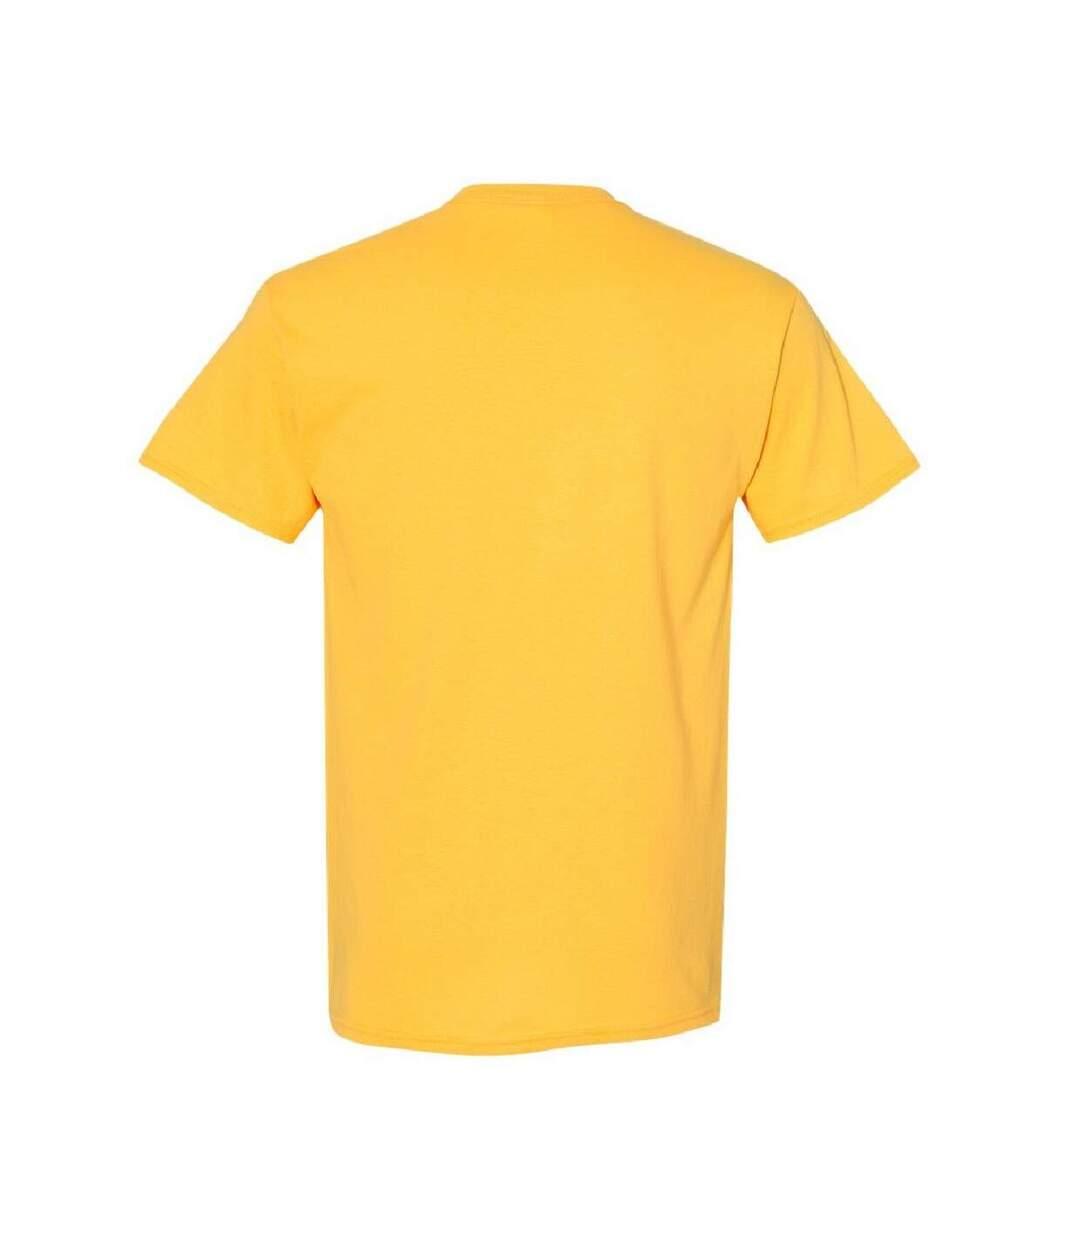 Gildan Mens Heavy Cotton Short Sleeve T-Shirt (Pack Of 5) (Charcoal) - UTBC4807